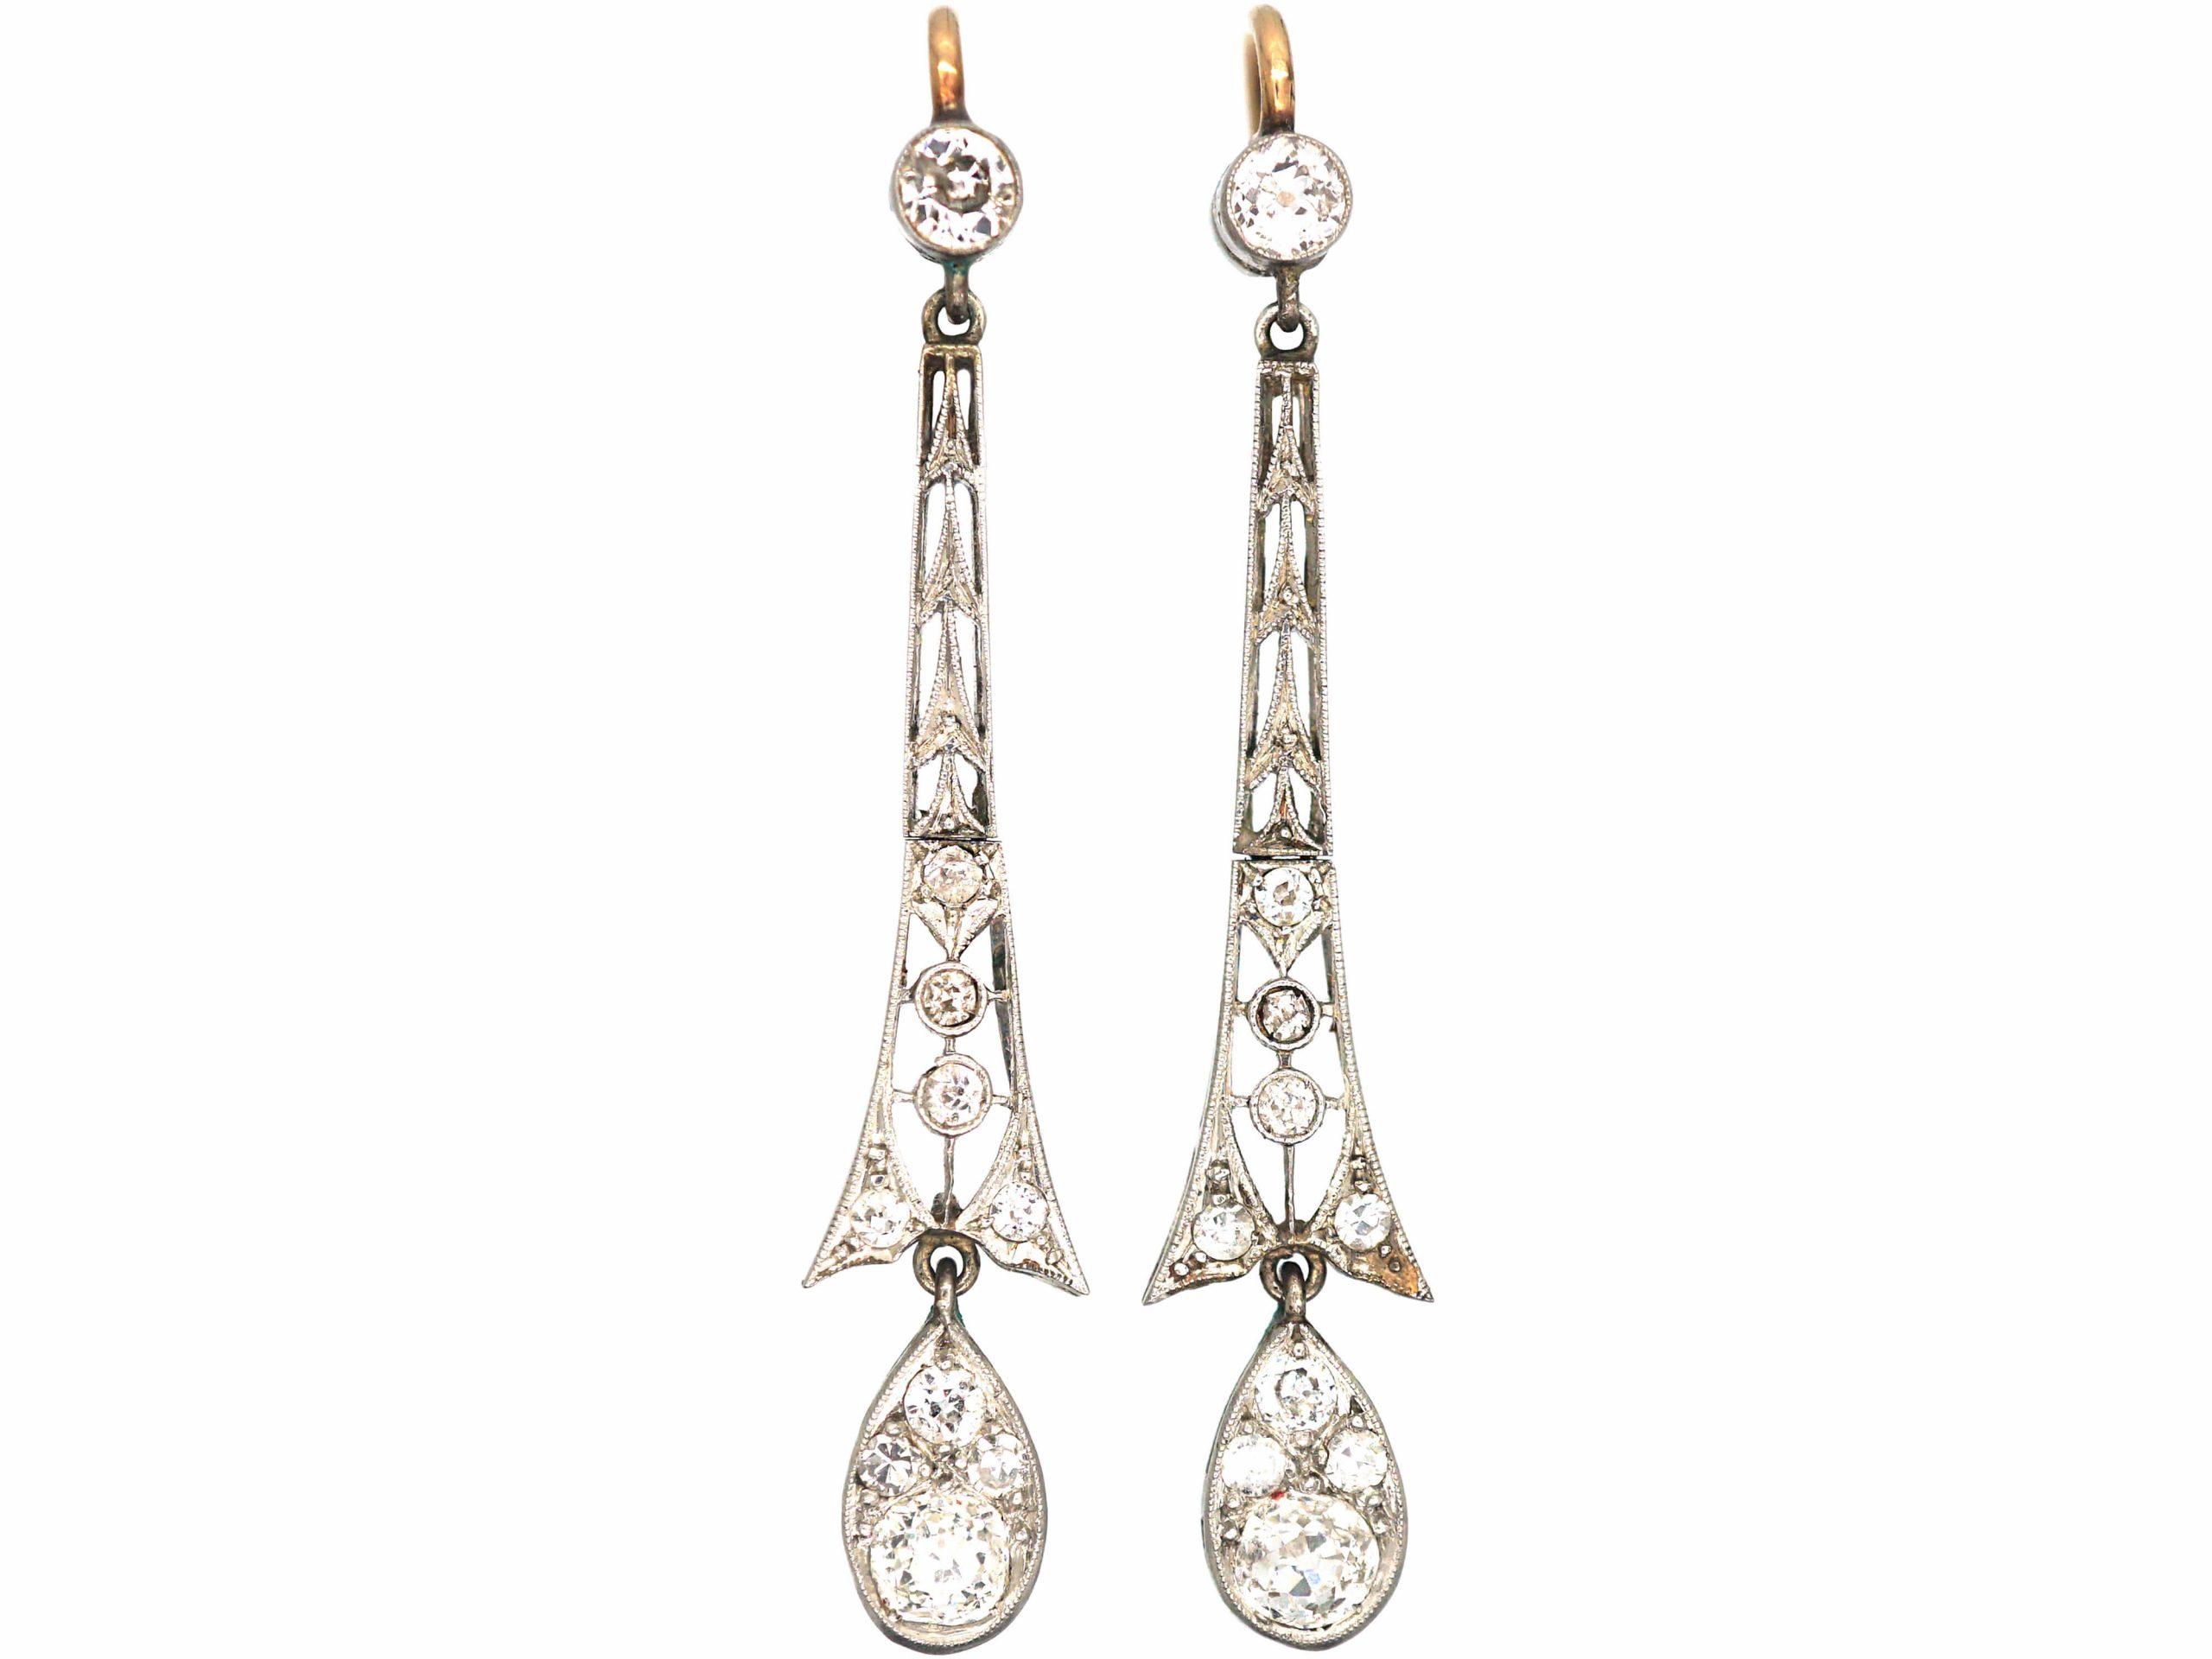 Art Deco 15ct Gold, Platinum & Diamond Drop Earrings